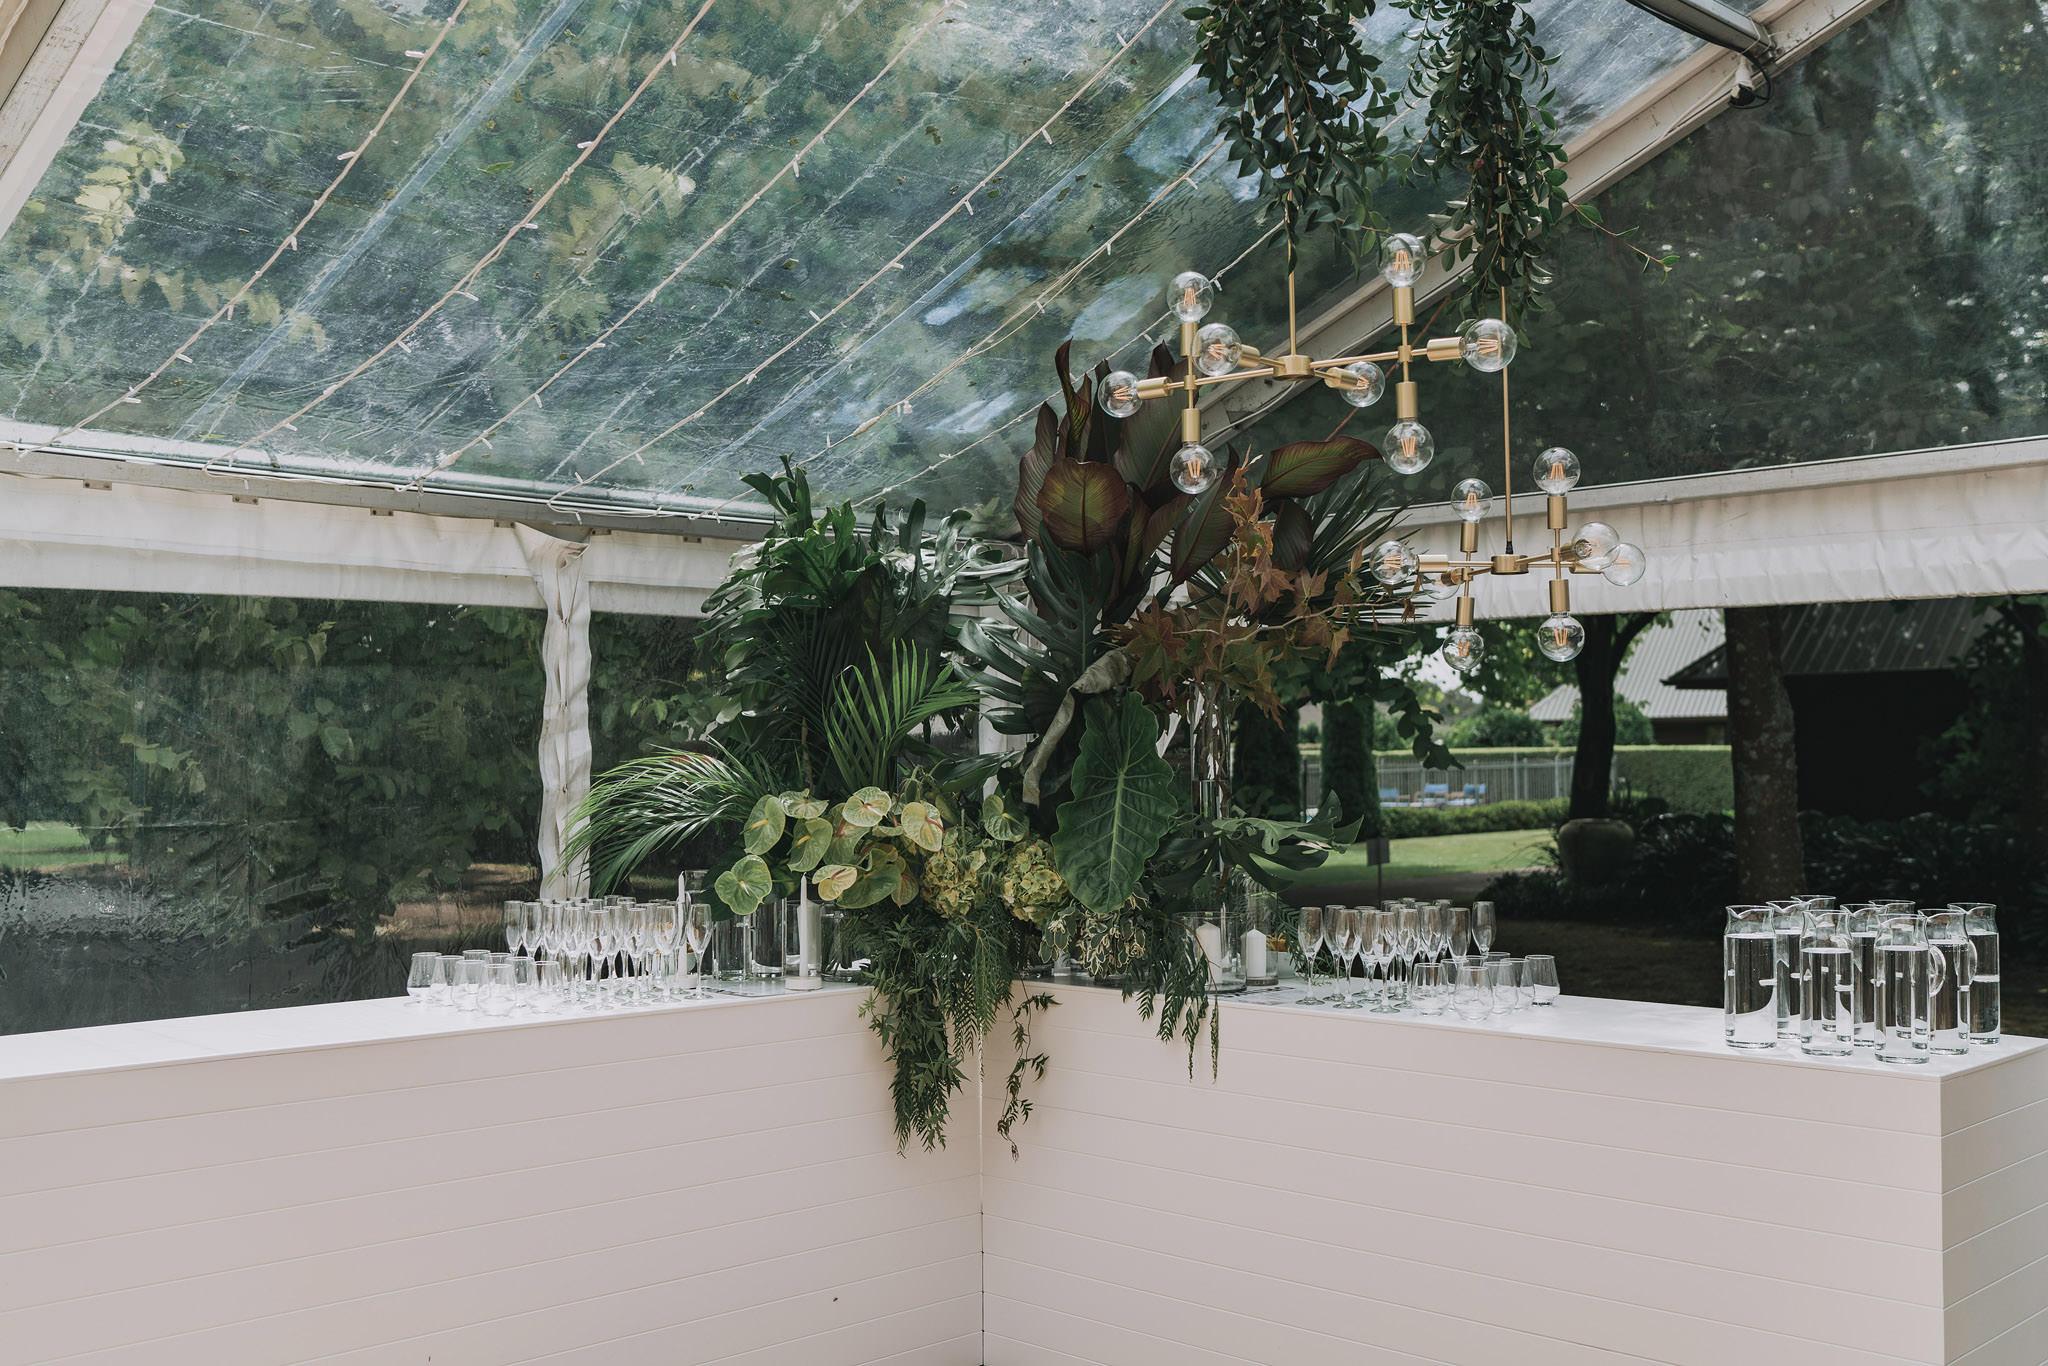 On My Hand wedding flowers - real wedding portfolio - Abbey and Ash - bar flower decorations in wedding reception marquee